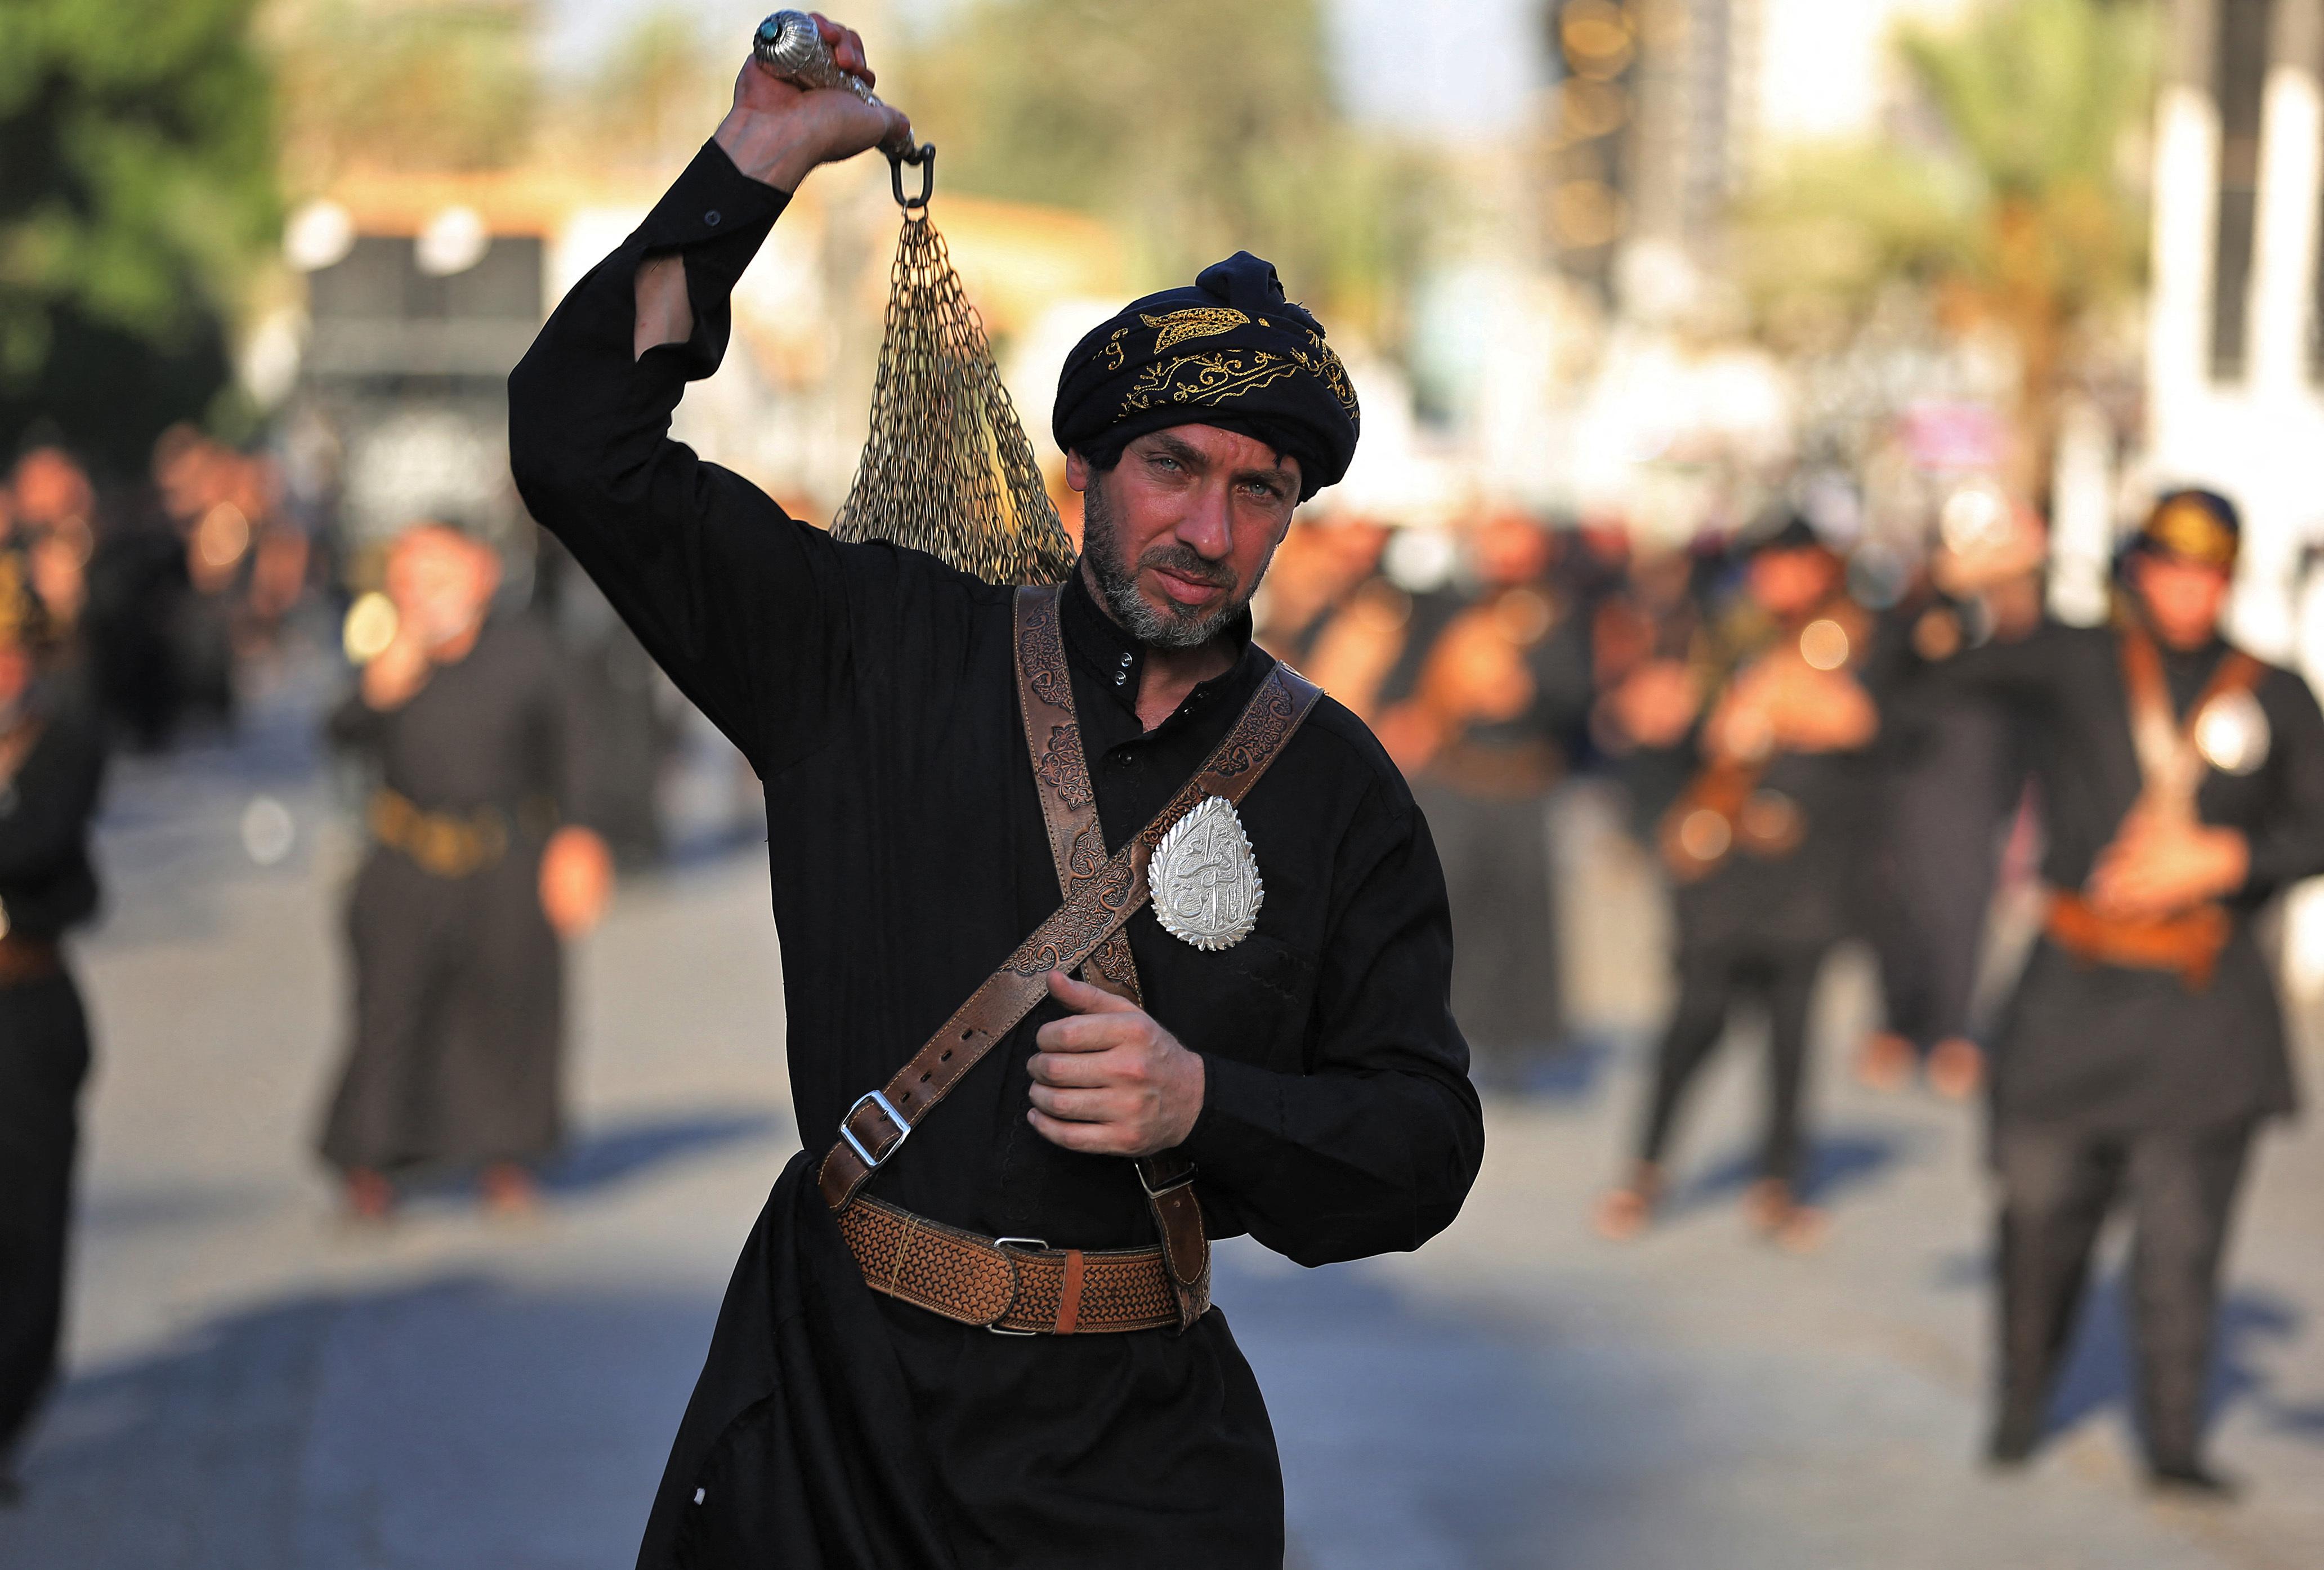 Foto: AHMAD AL-RUBAYE/AFP via Getty Images